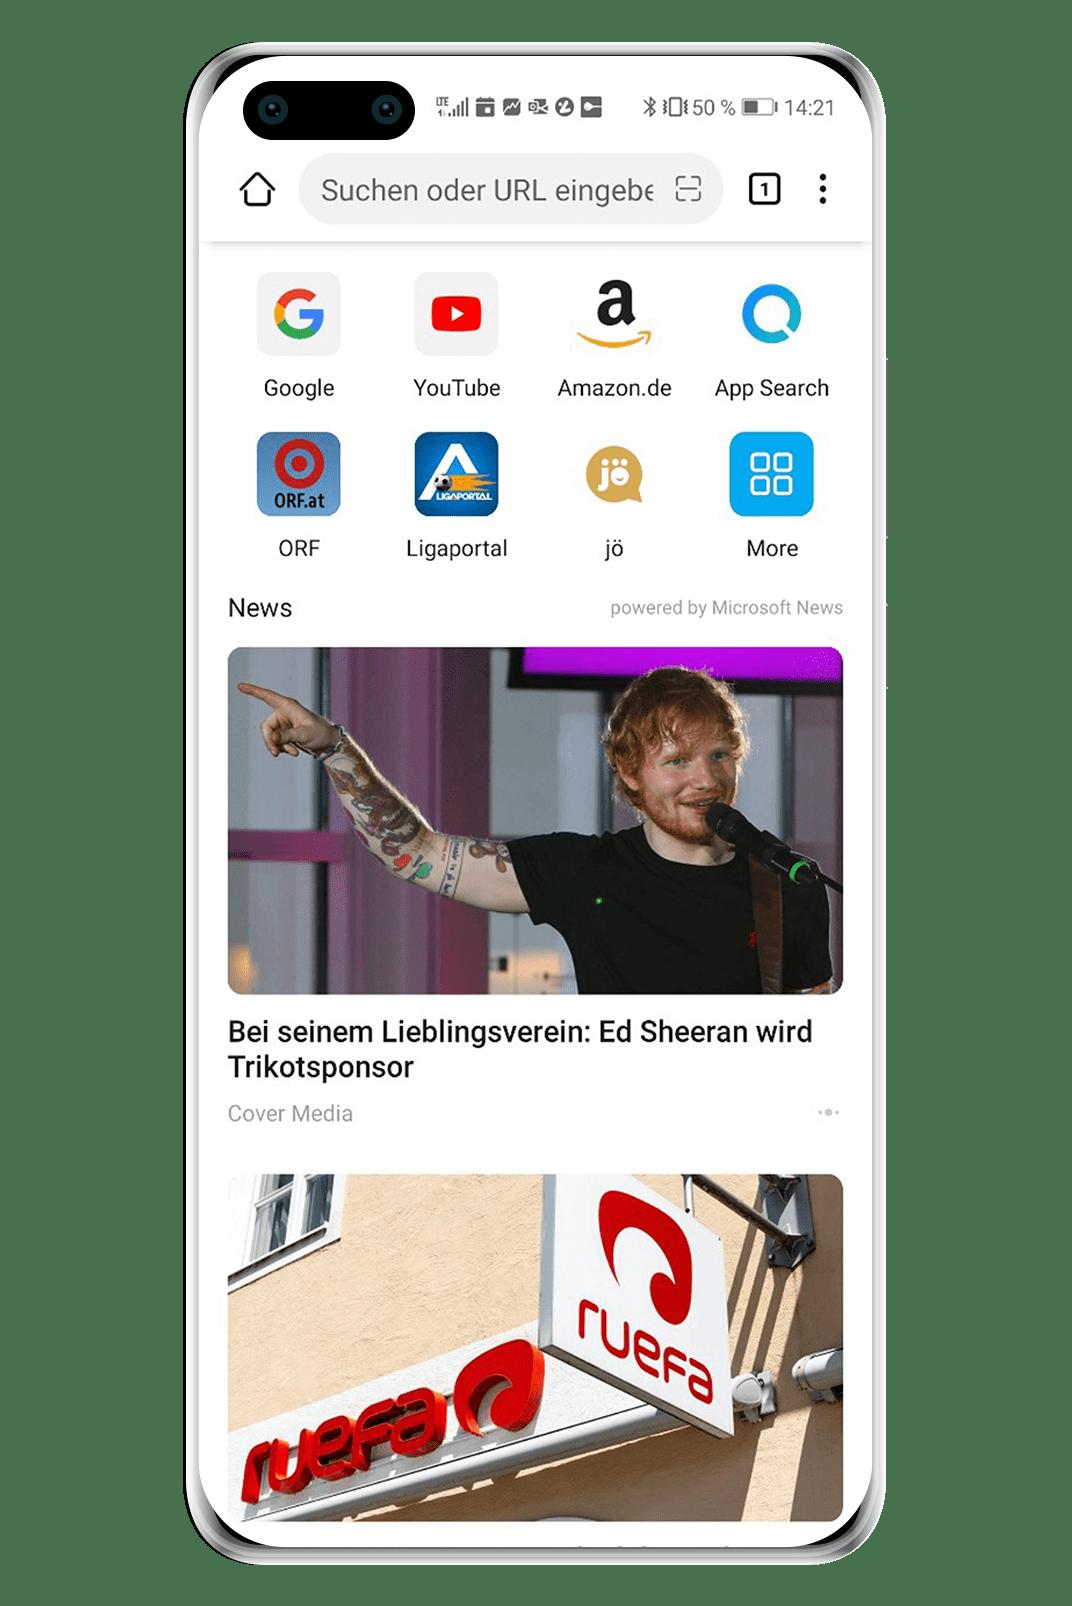 Ligaportal als Shortcut im Huawei Browser Speed Dial